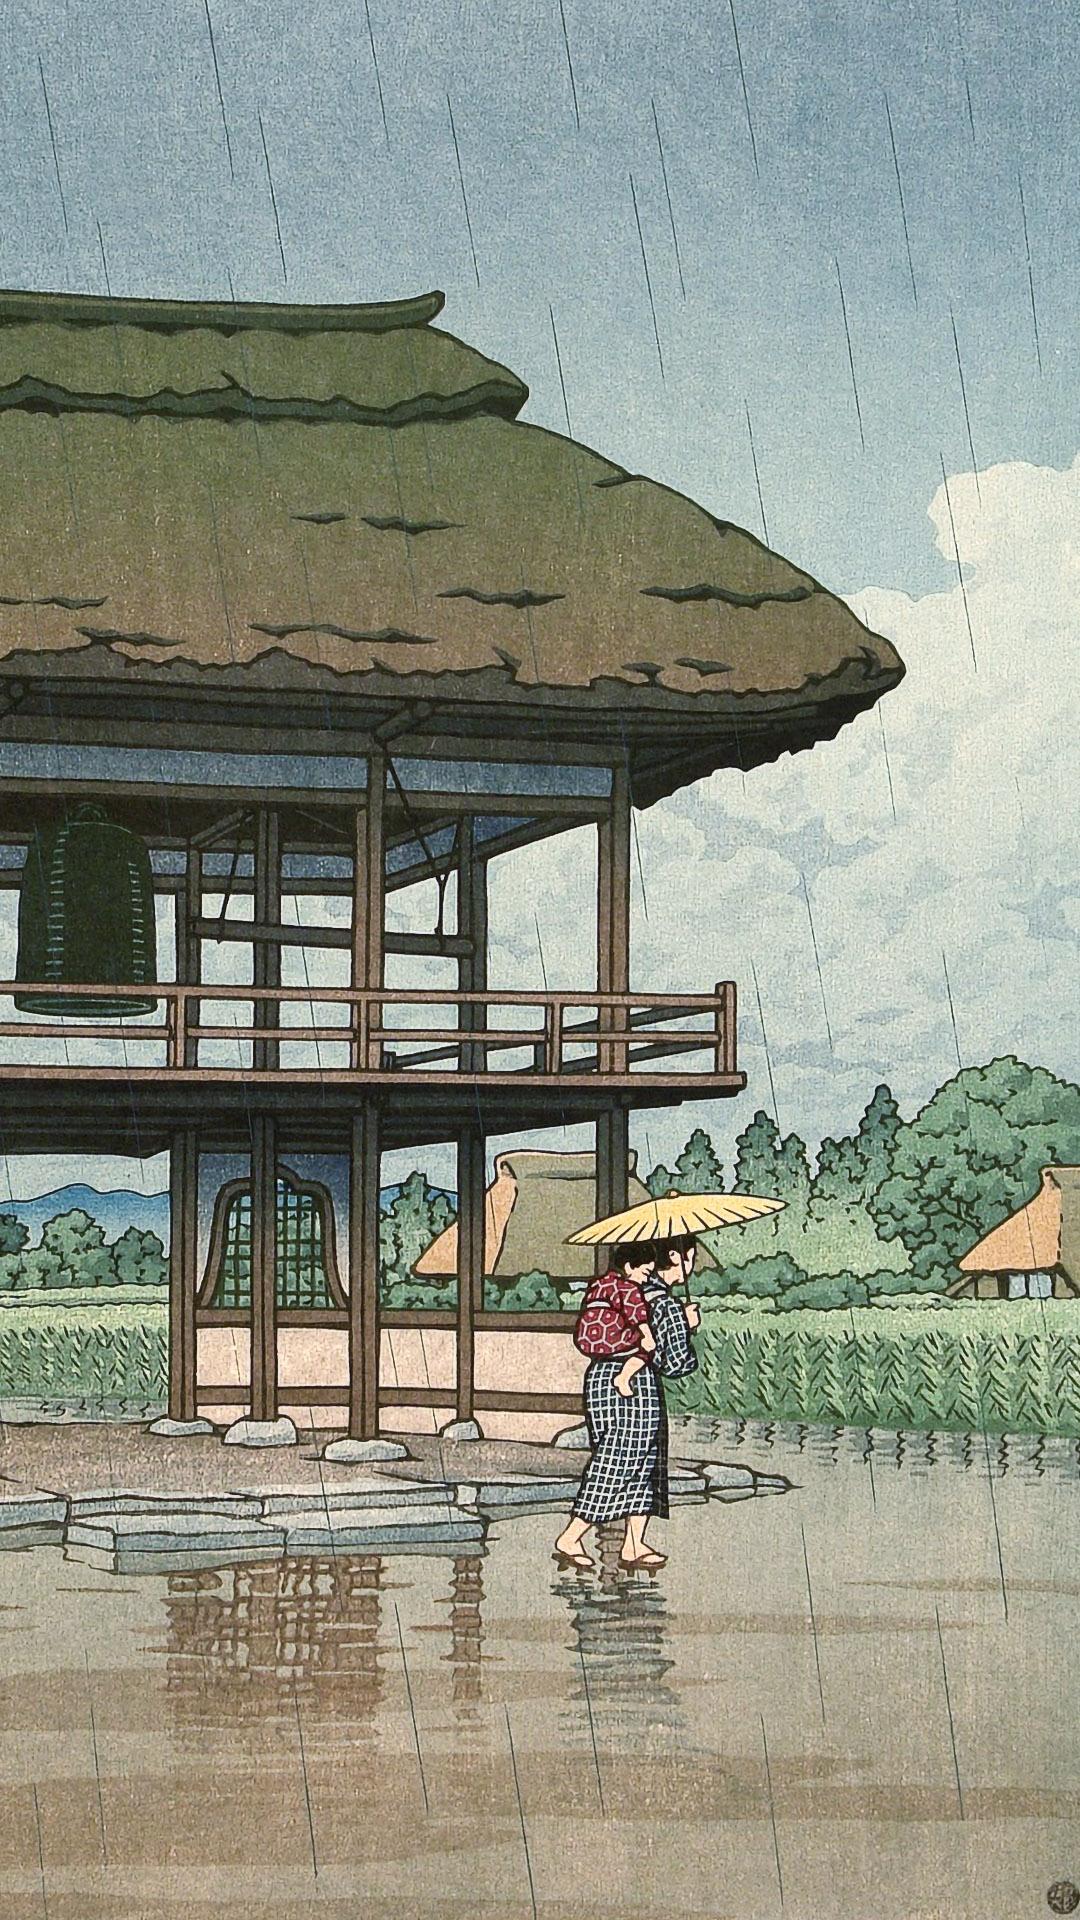 川瀬巴水 宮崎源蔵寺 埼玉 Kawase Hasui - Miyazaki genzoji(saitama) 1080x1920